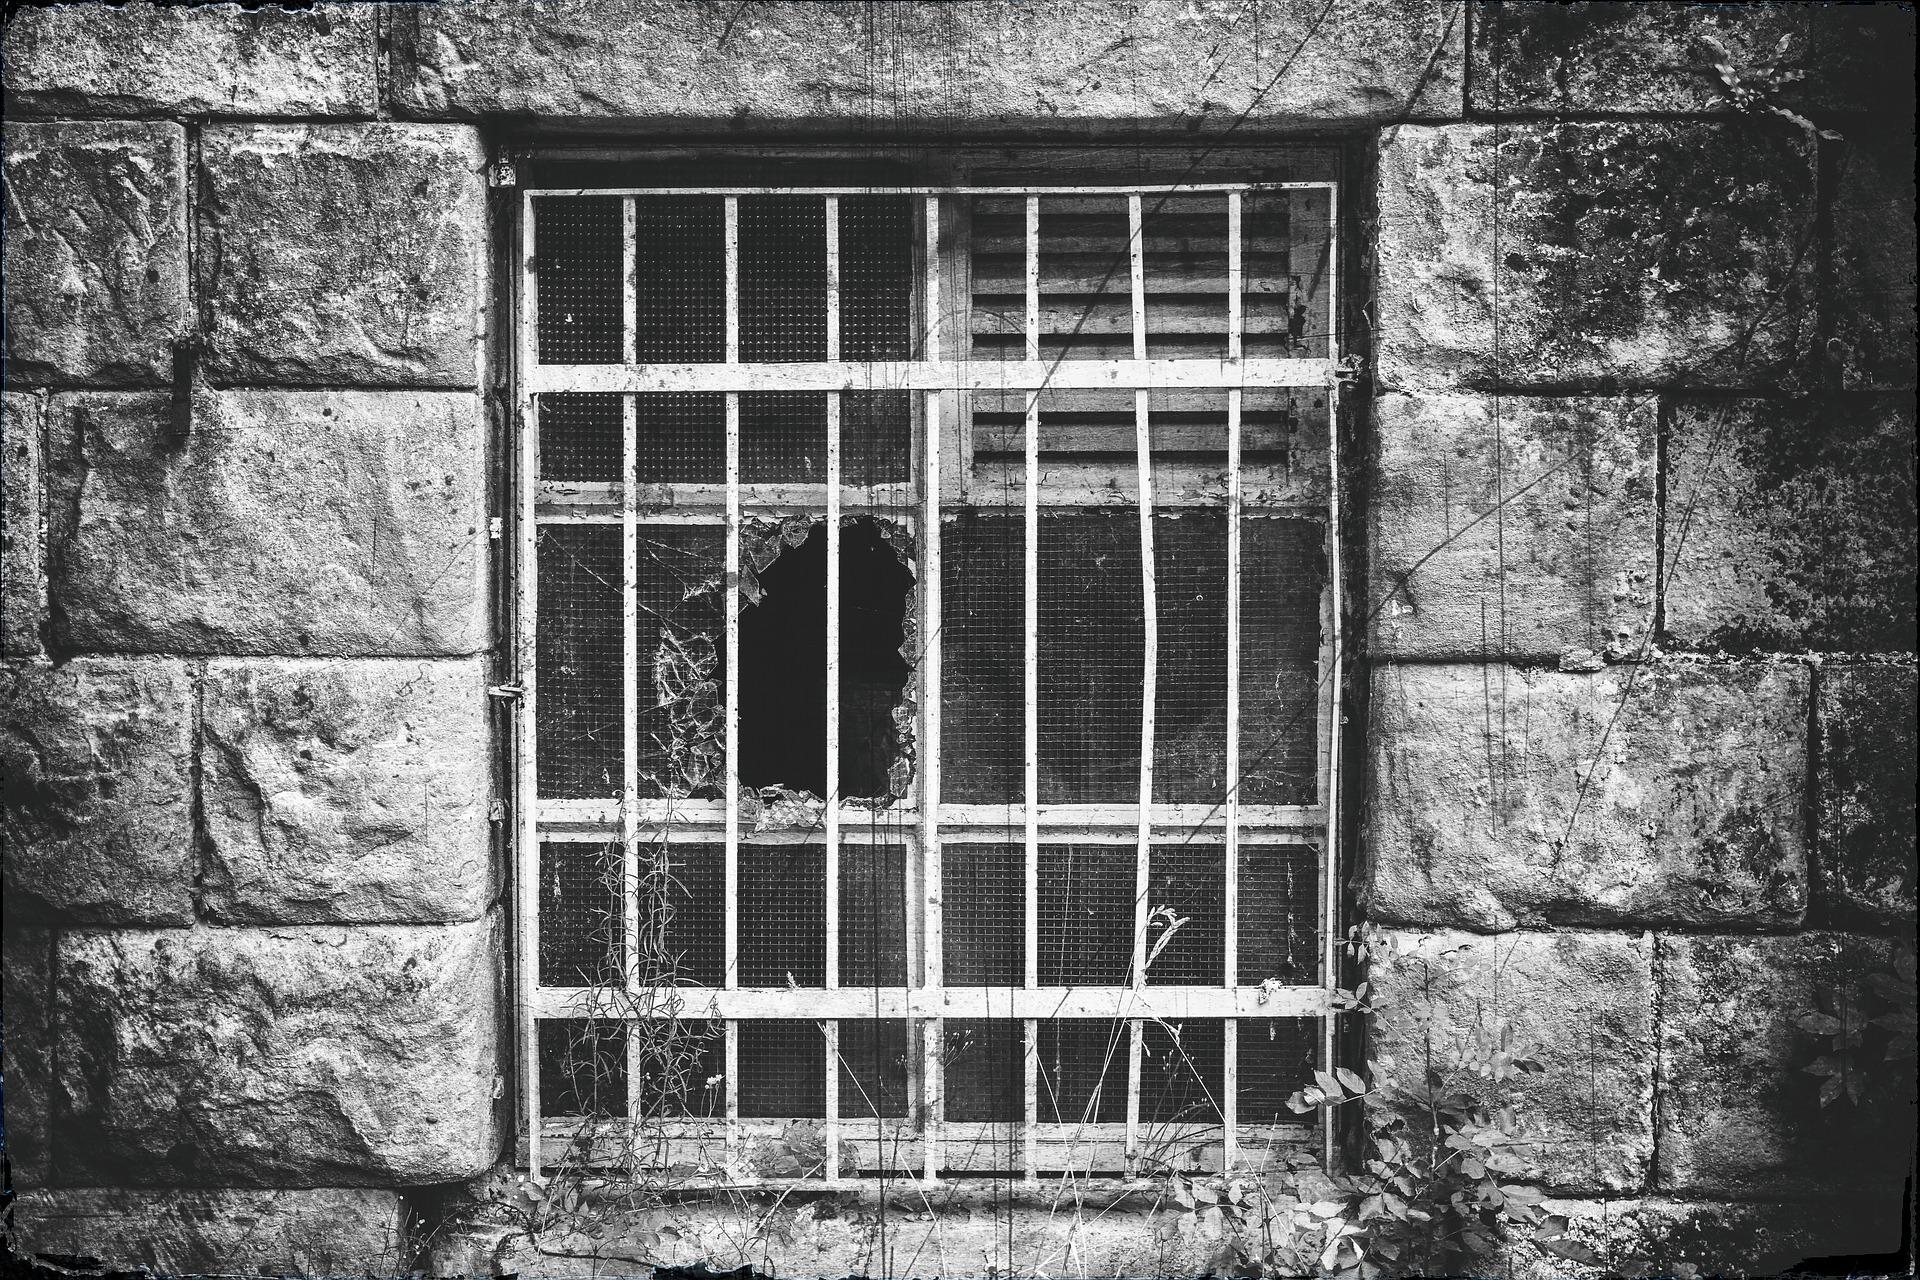 Splitski zatvorenik se predozirao?